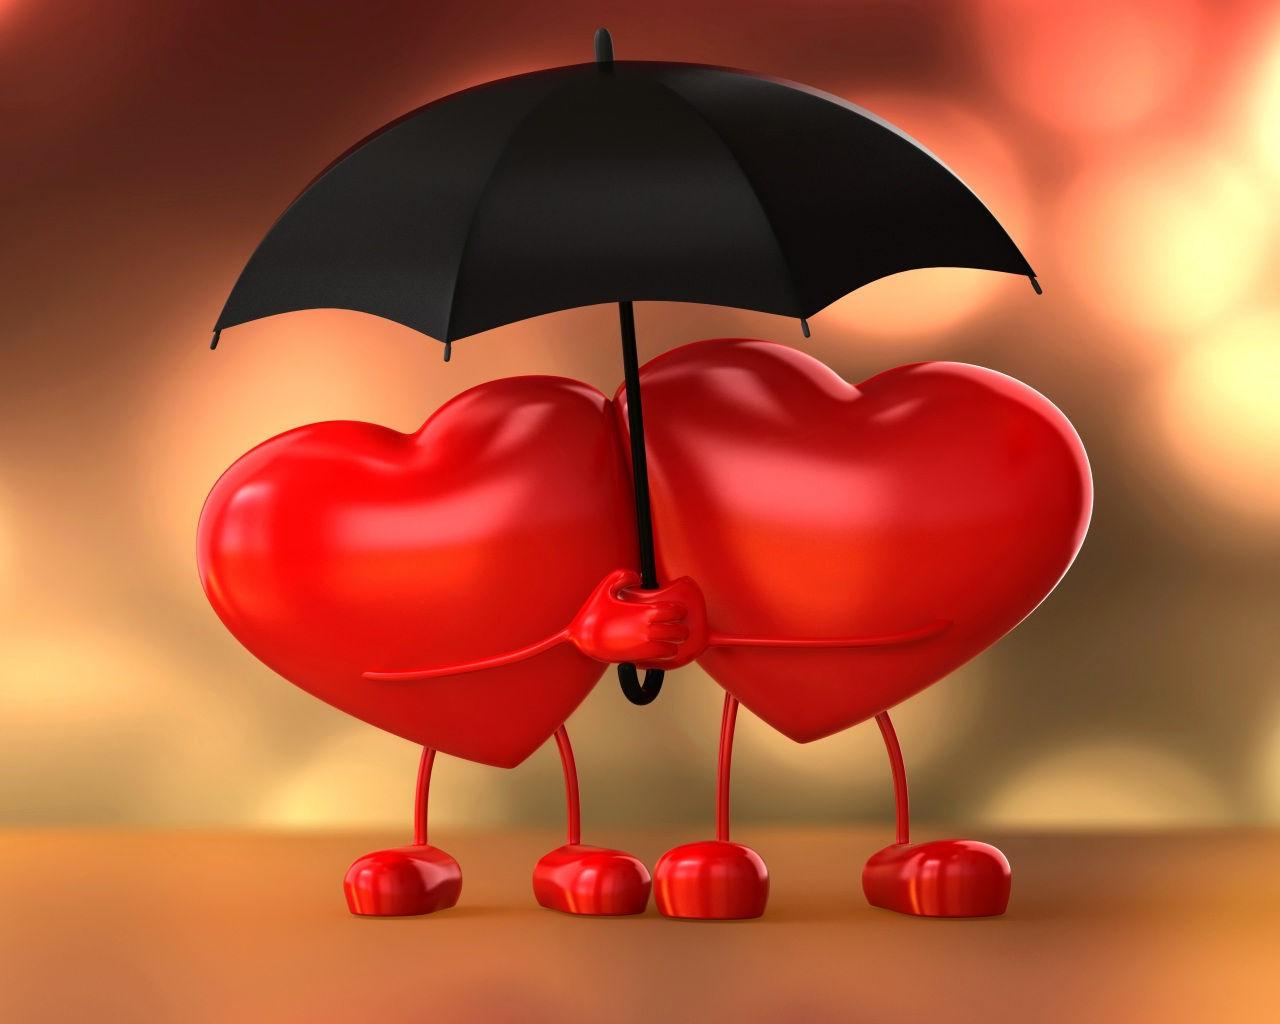 Fonds D'écran St-valentin Amour - MaximumWall